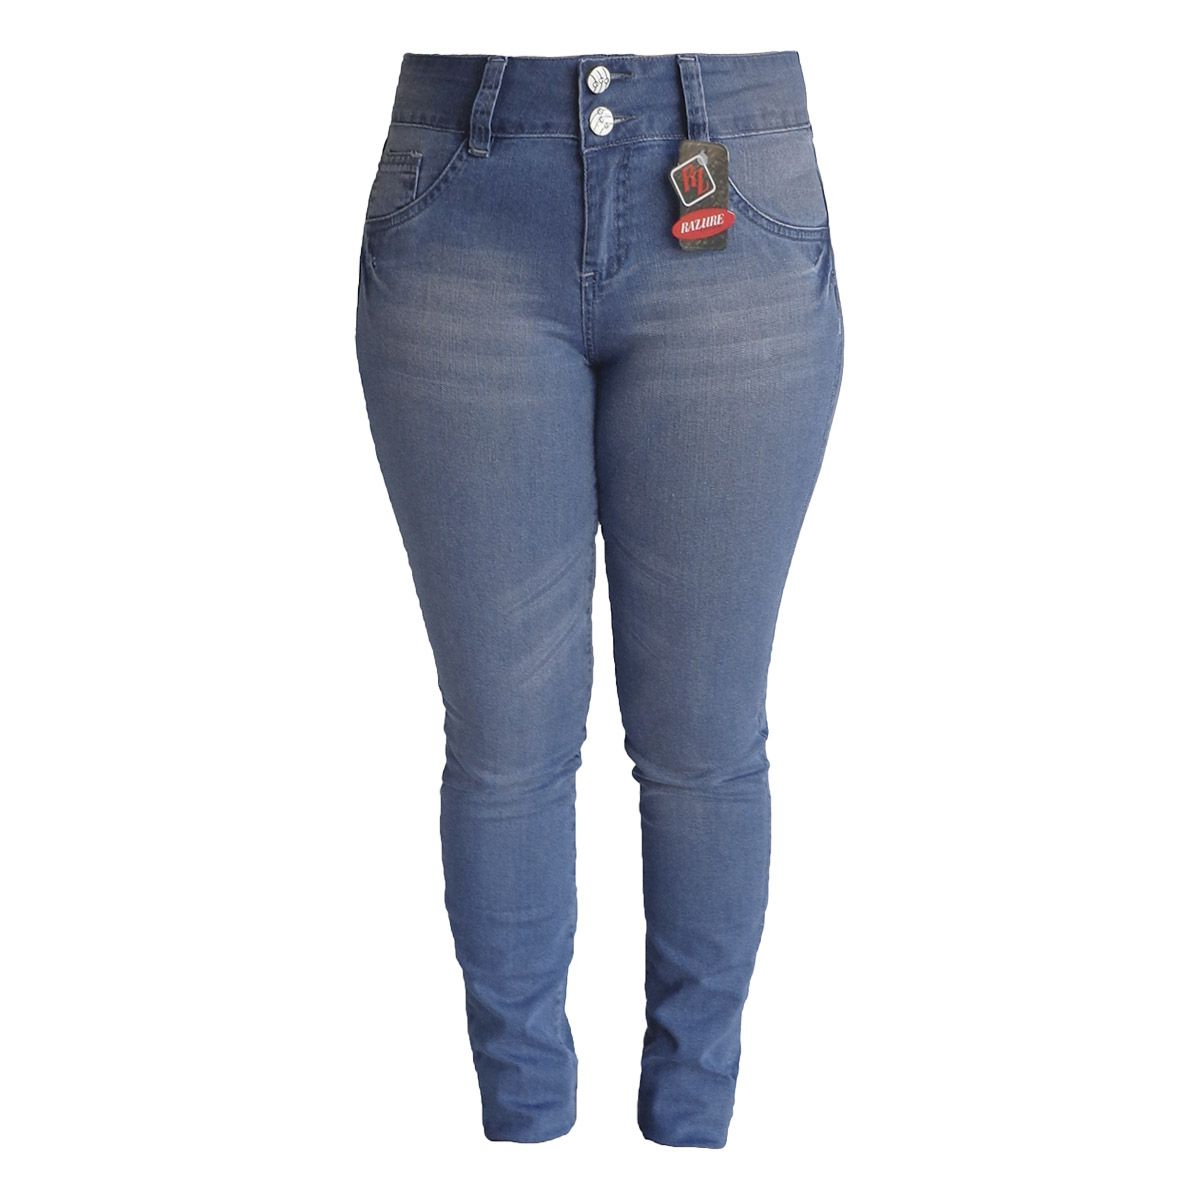 Calça Jeans Feminina Skinny Tamanho 42